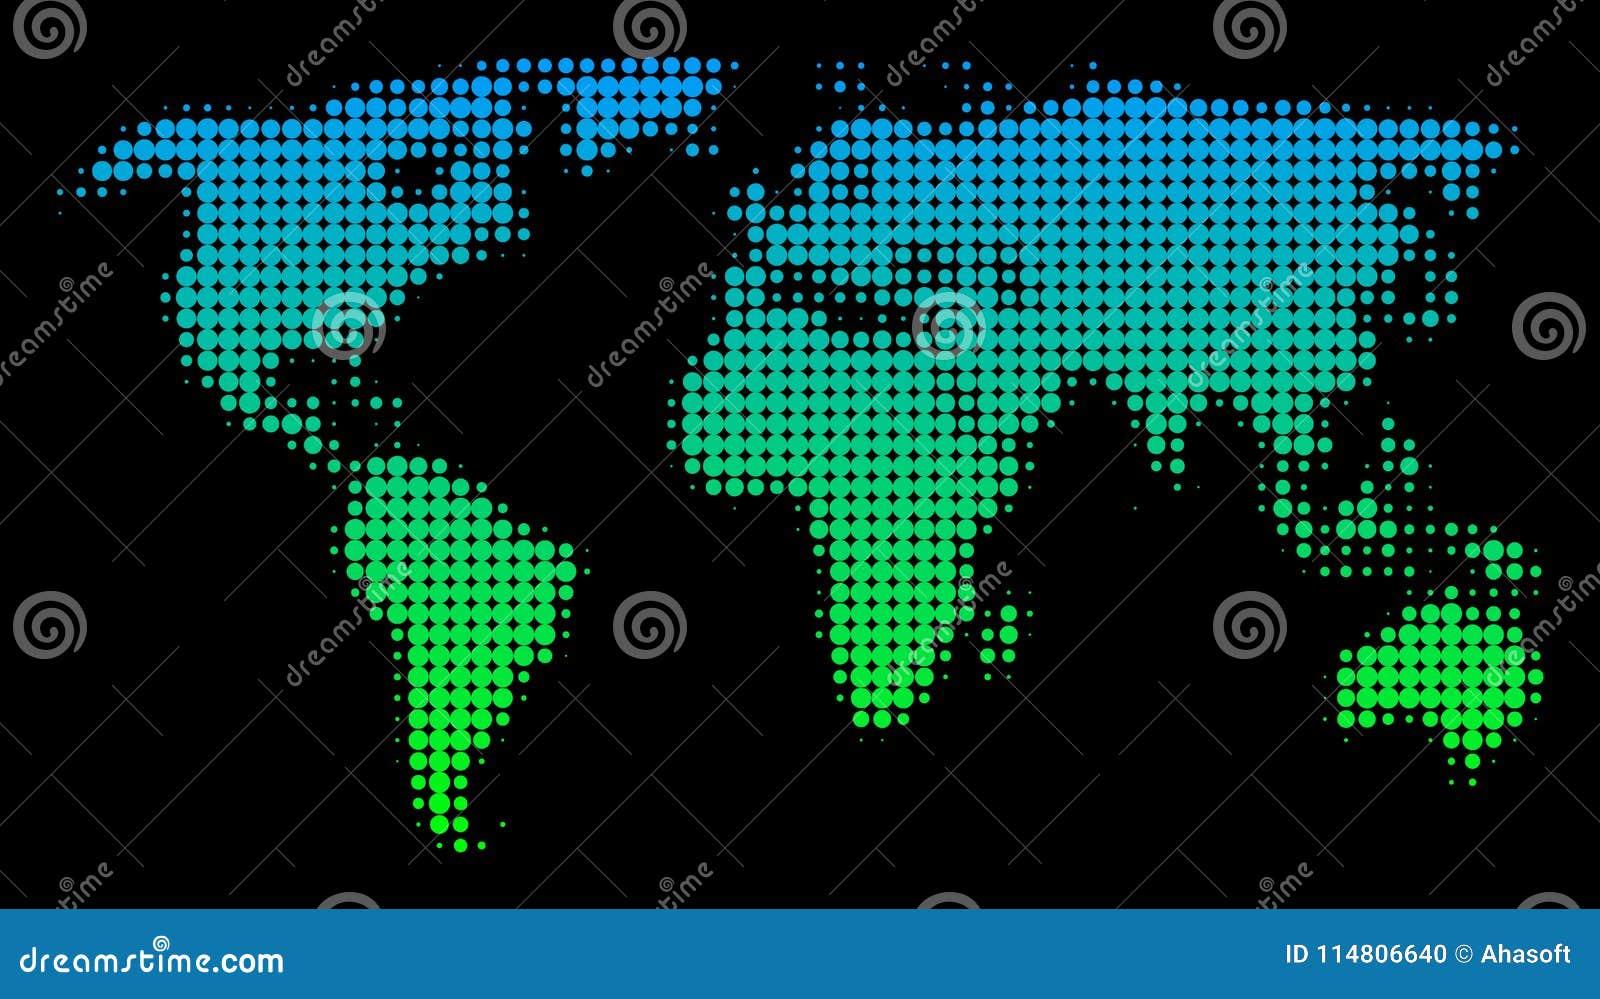 Halftone world map stock vector illustration of halftone 114806640 download halftone world map stock vector illustration of halftone 114806640 gumiabroncs Image collections